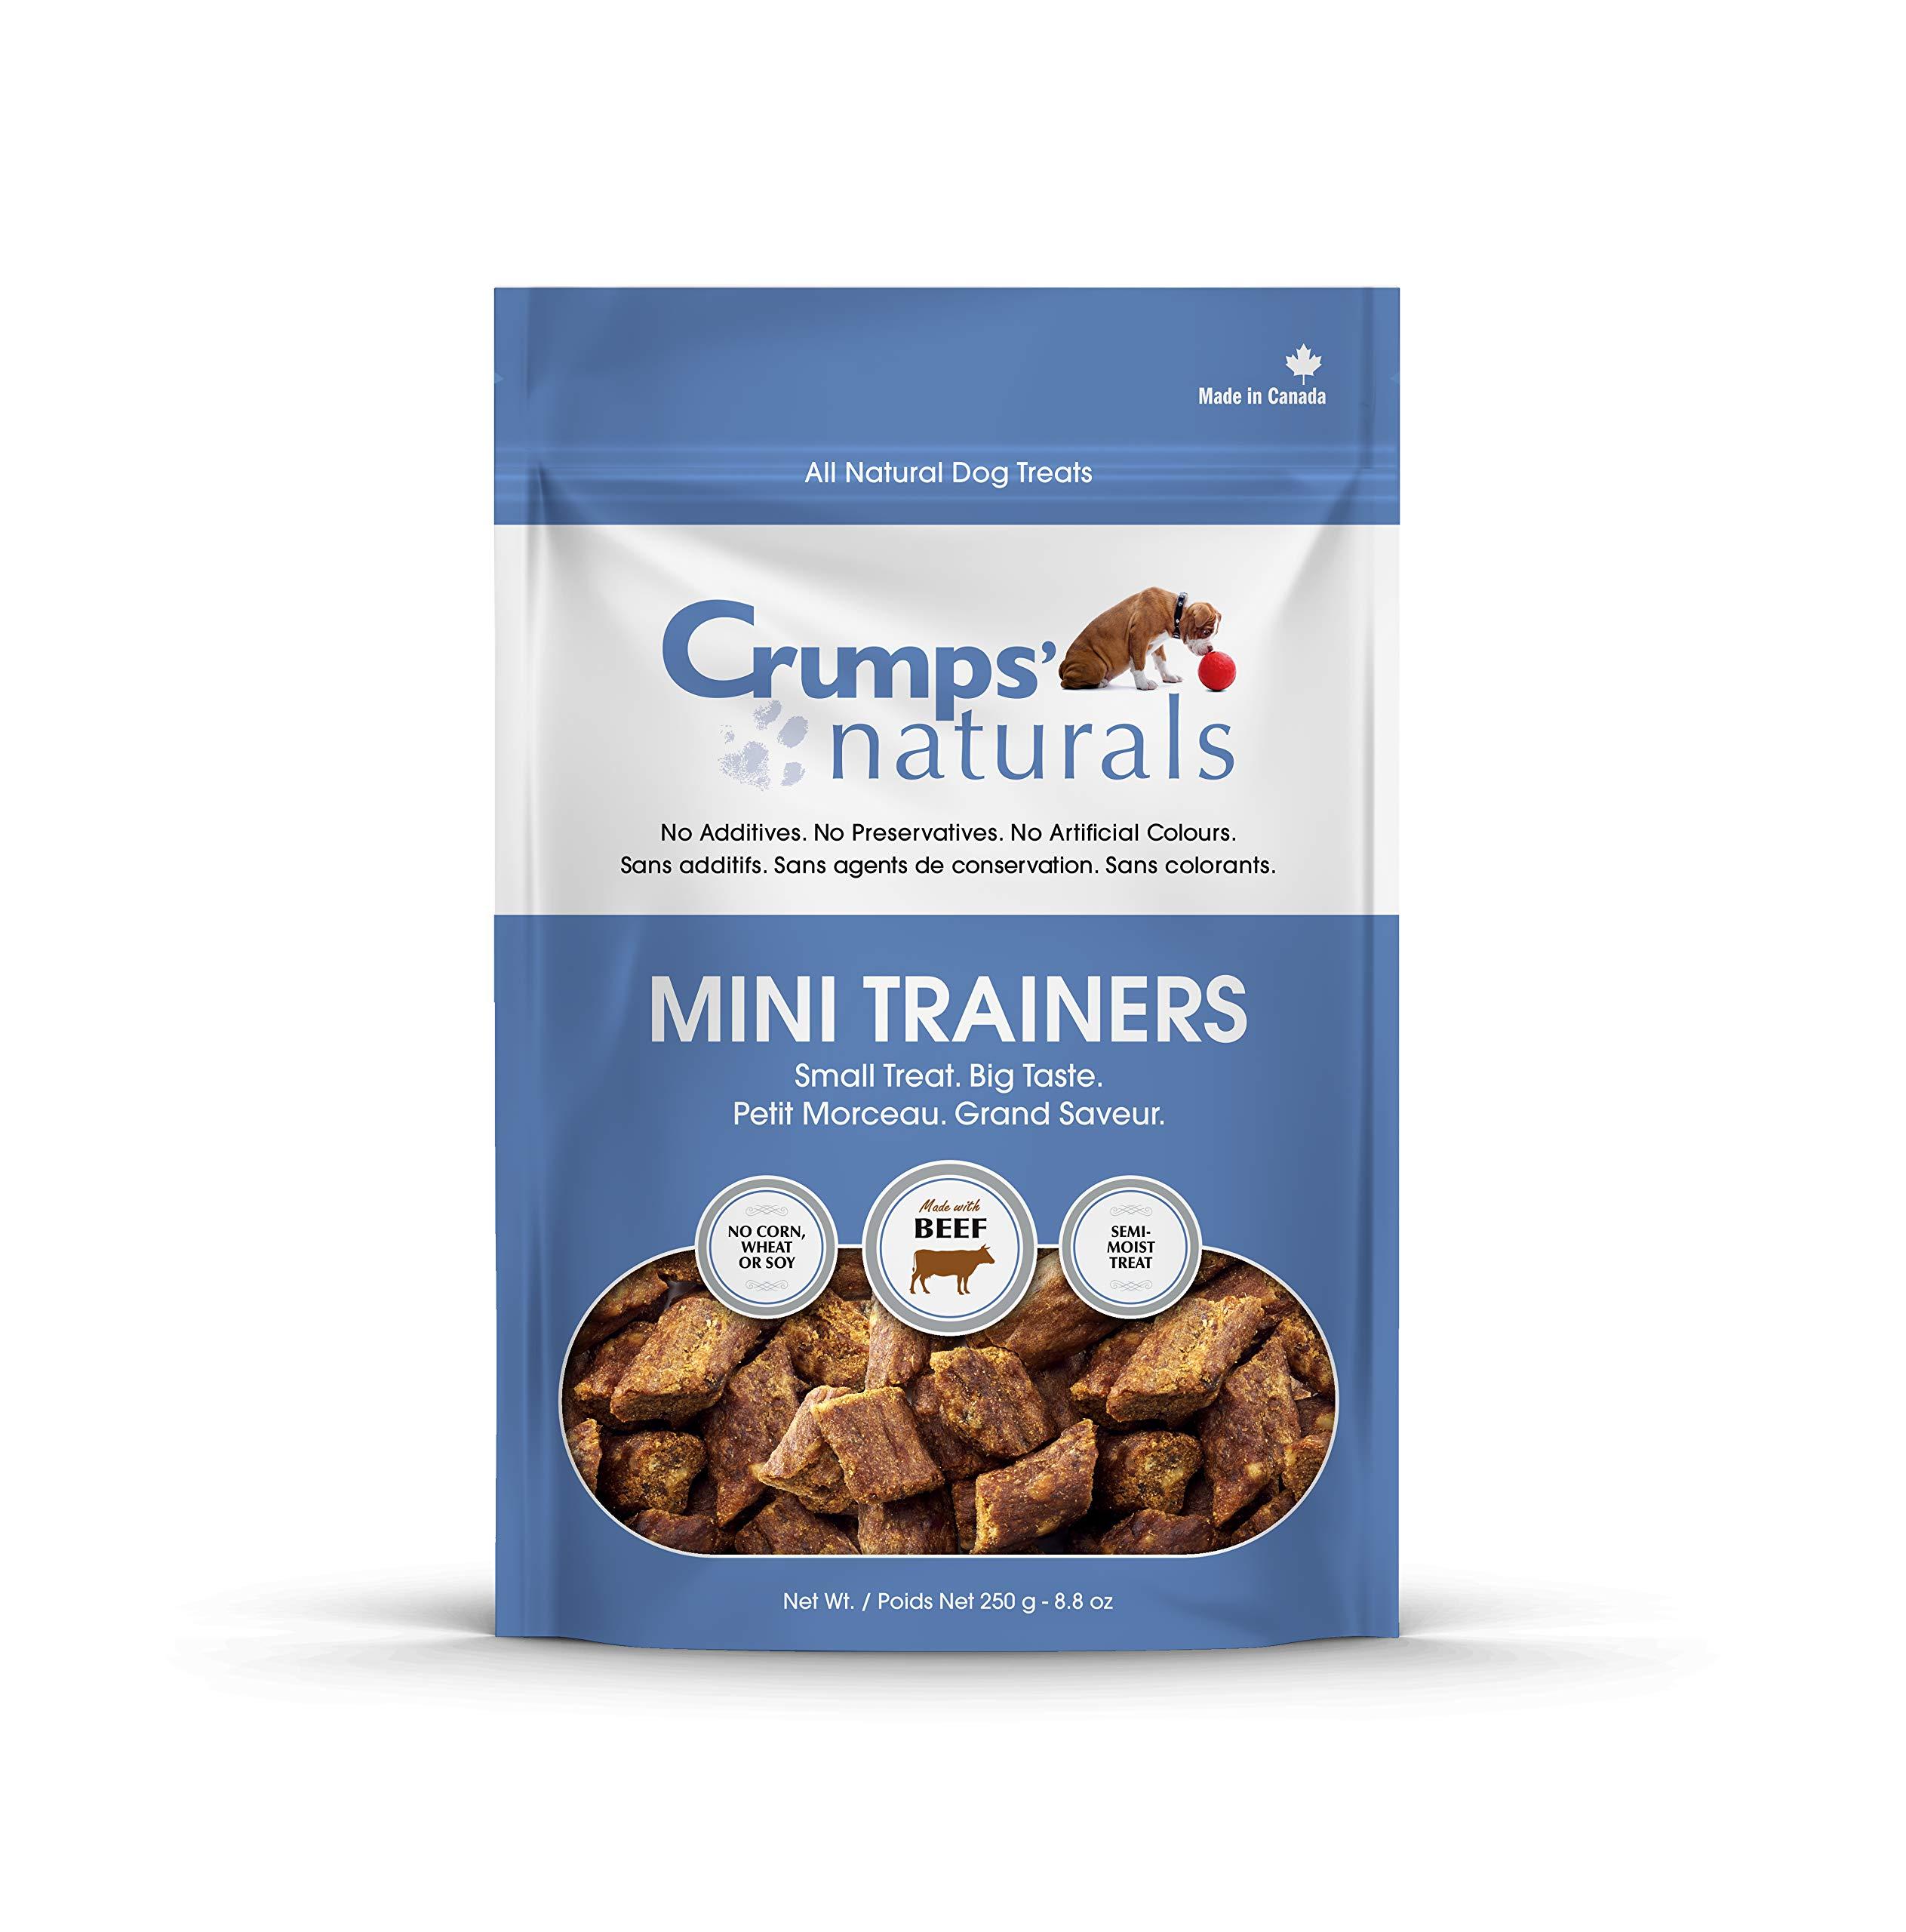 Crumps' Naturals Mt-B-250 Mini Trainers Beef (Semi-Moist) (1 Pack), 250G/8.8 Oz by Crumps' Naturals